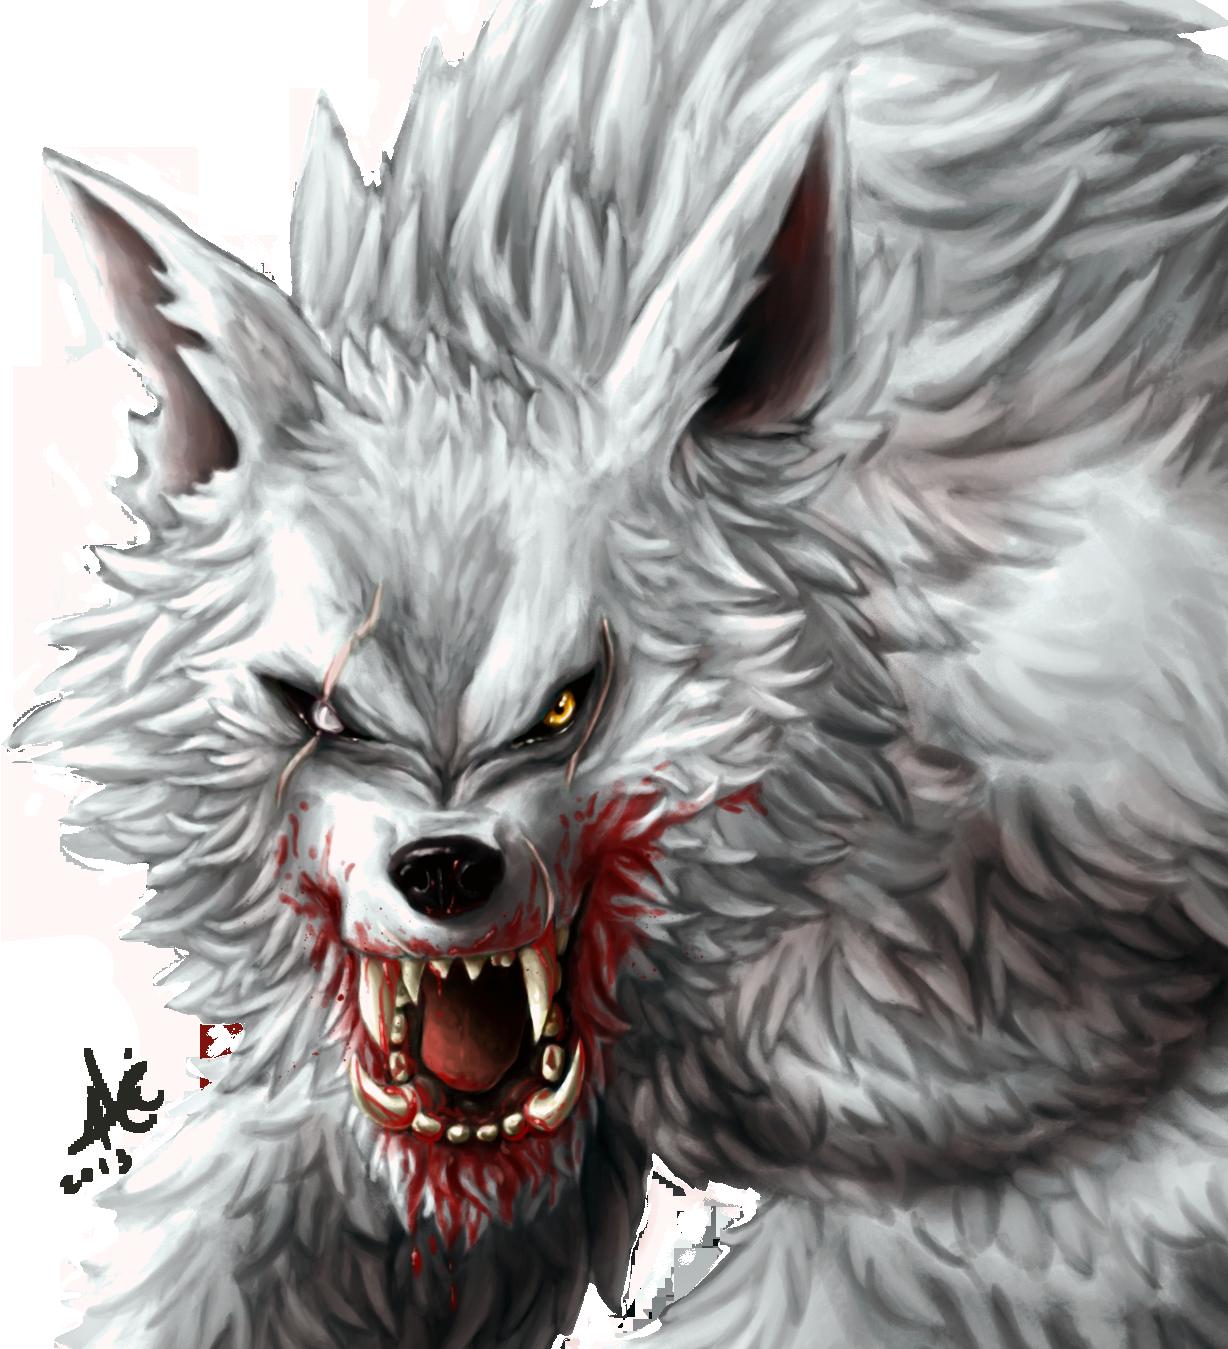 Drawn wolfman transparent Werewolf on  Alicemonstrinho on